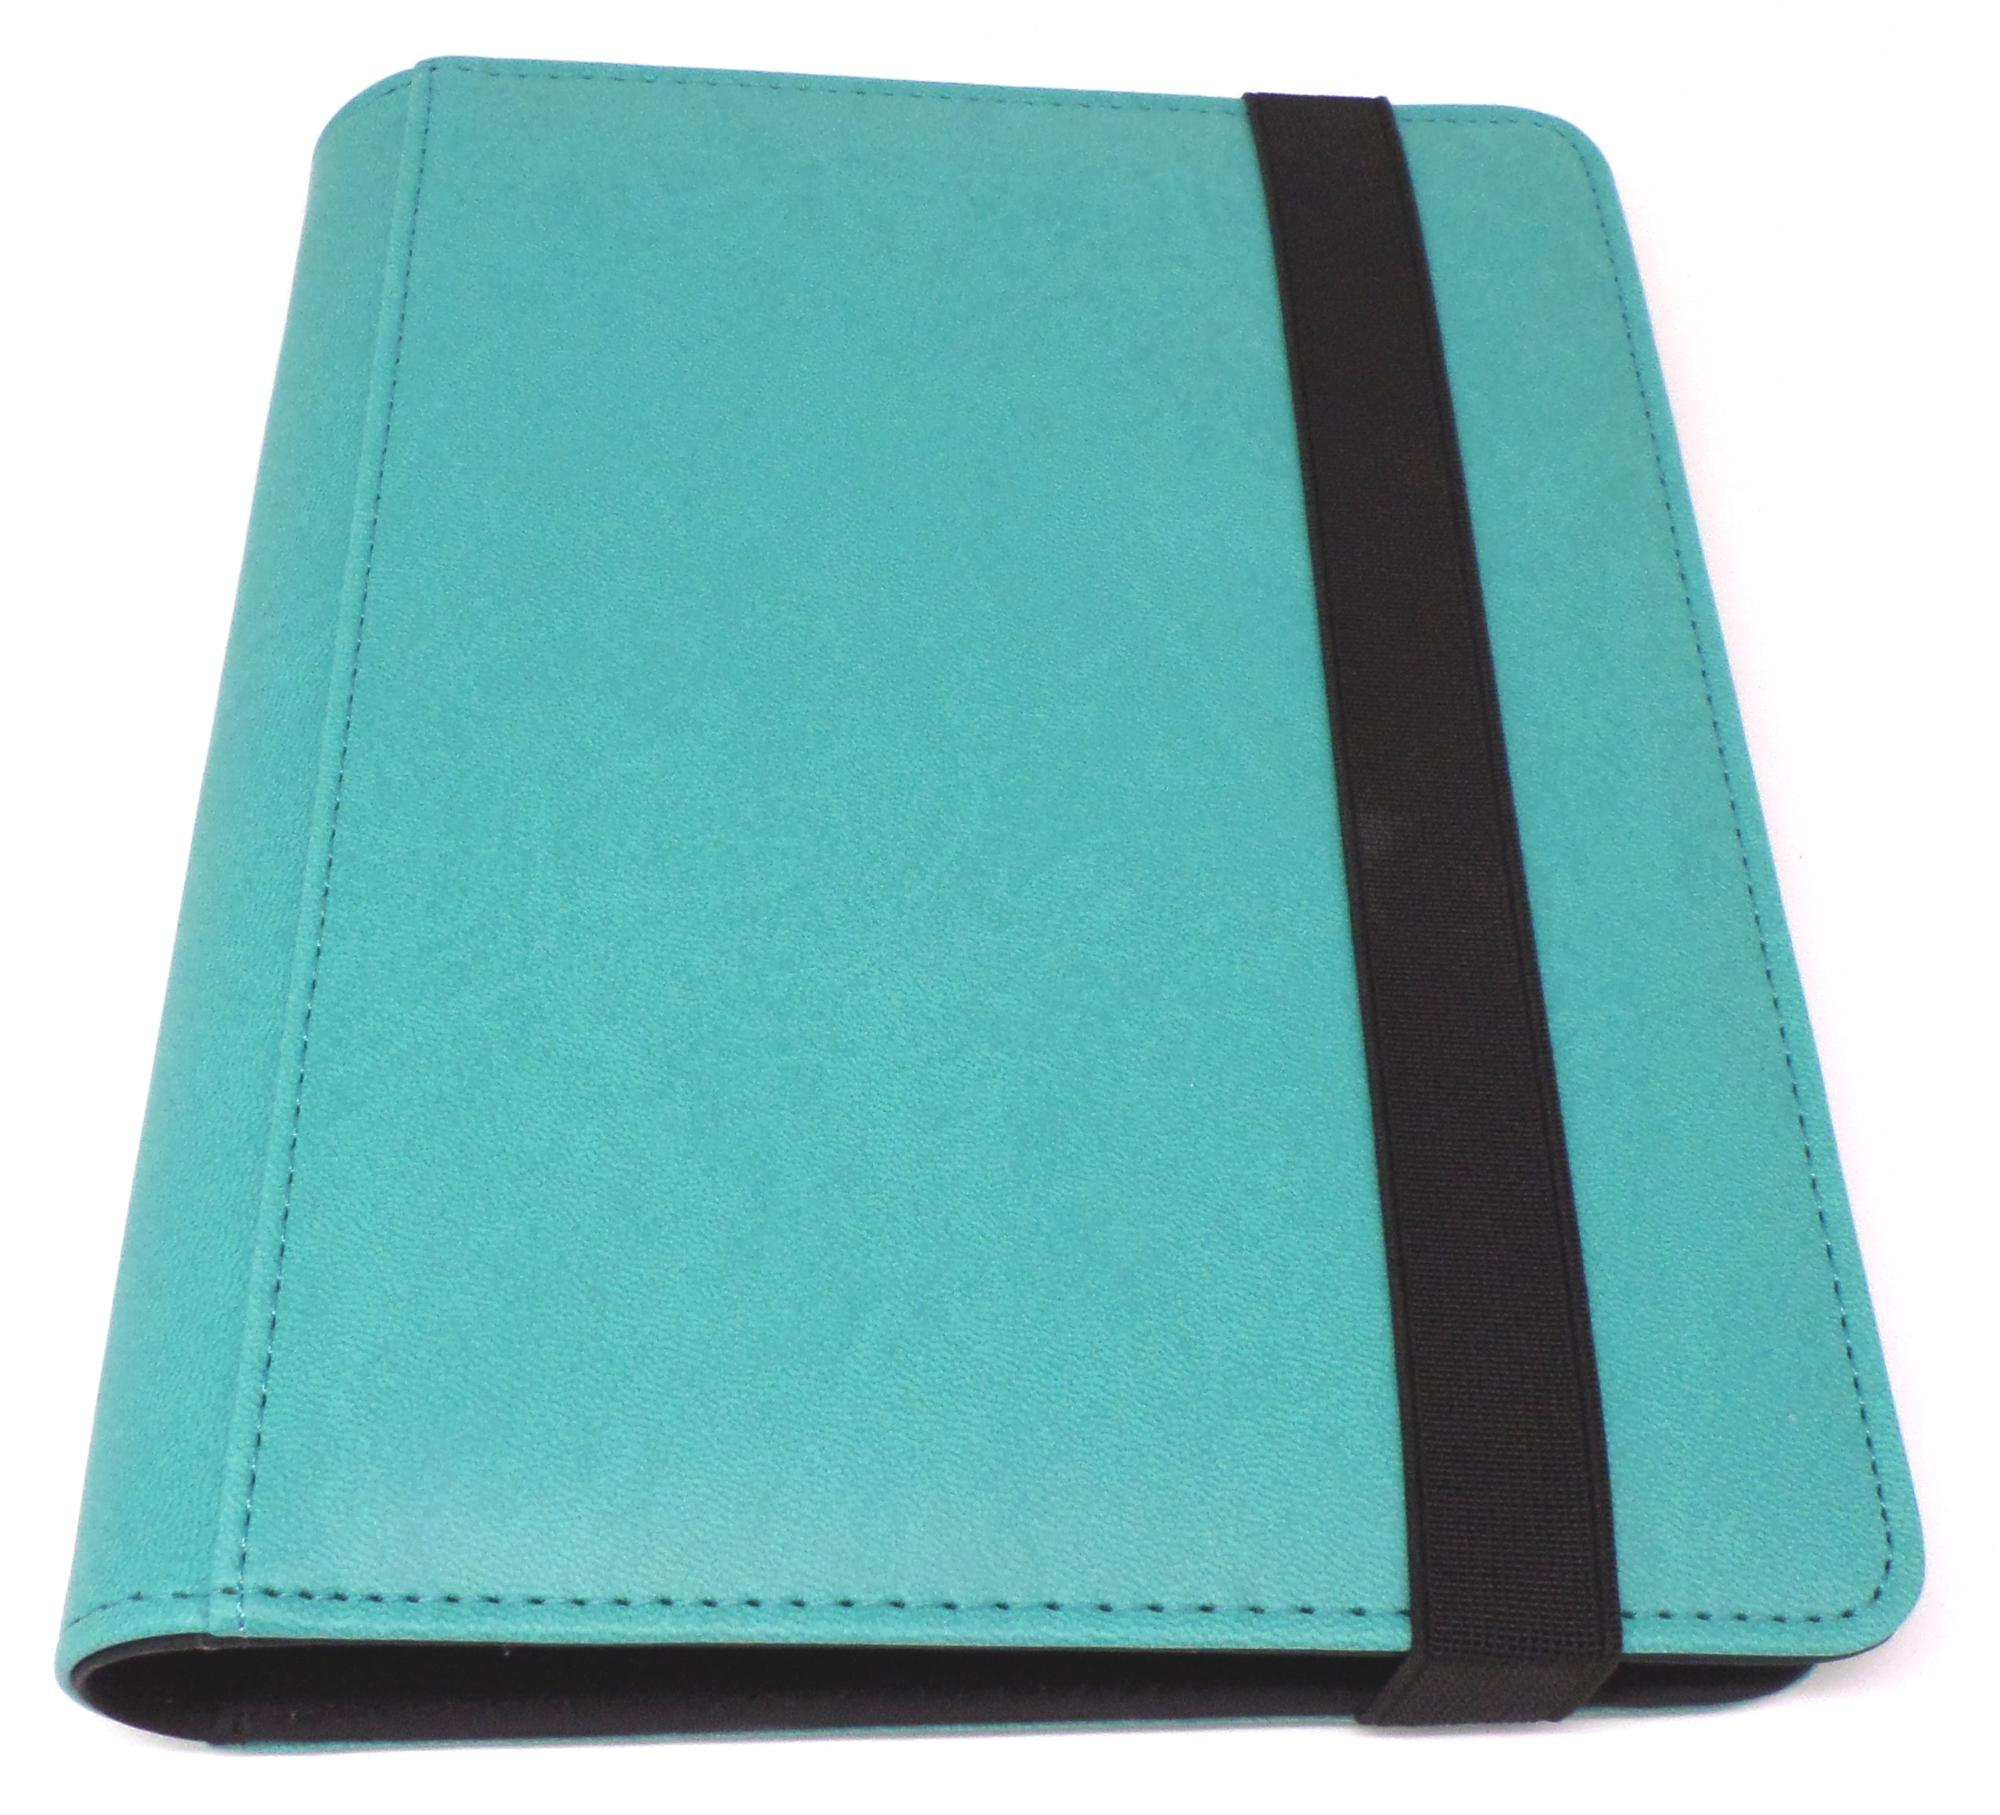 Docsmagic.de Premium Pro-Player 4-Pocket Zip-Album Dark Blue 160 Card Binder